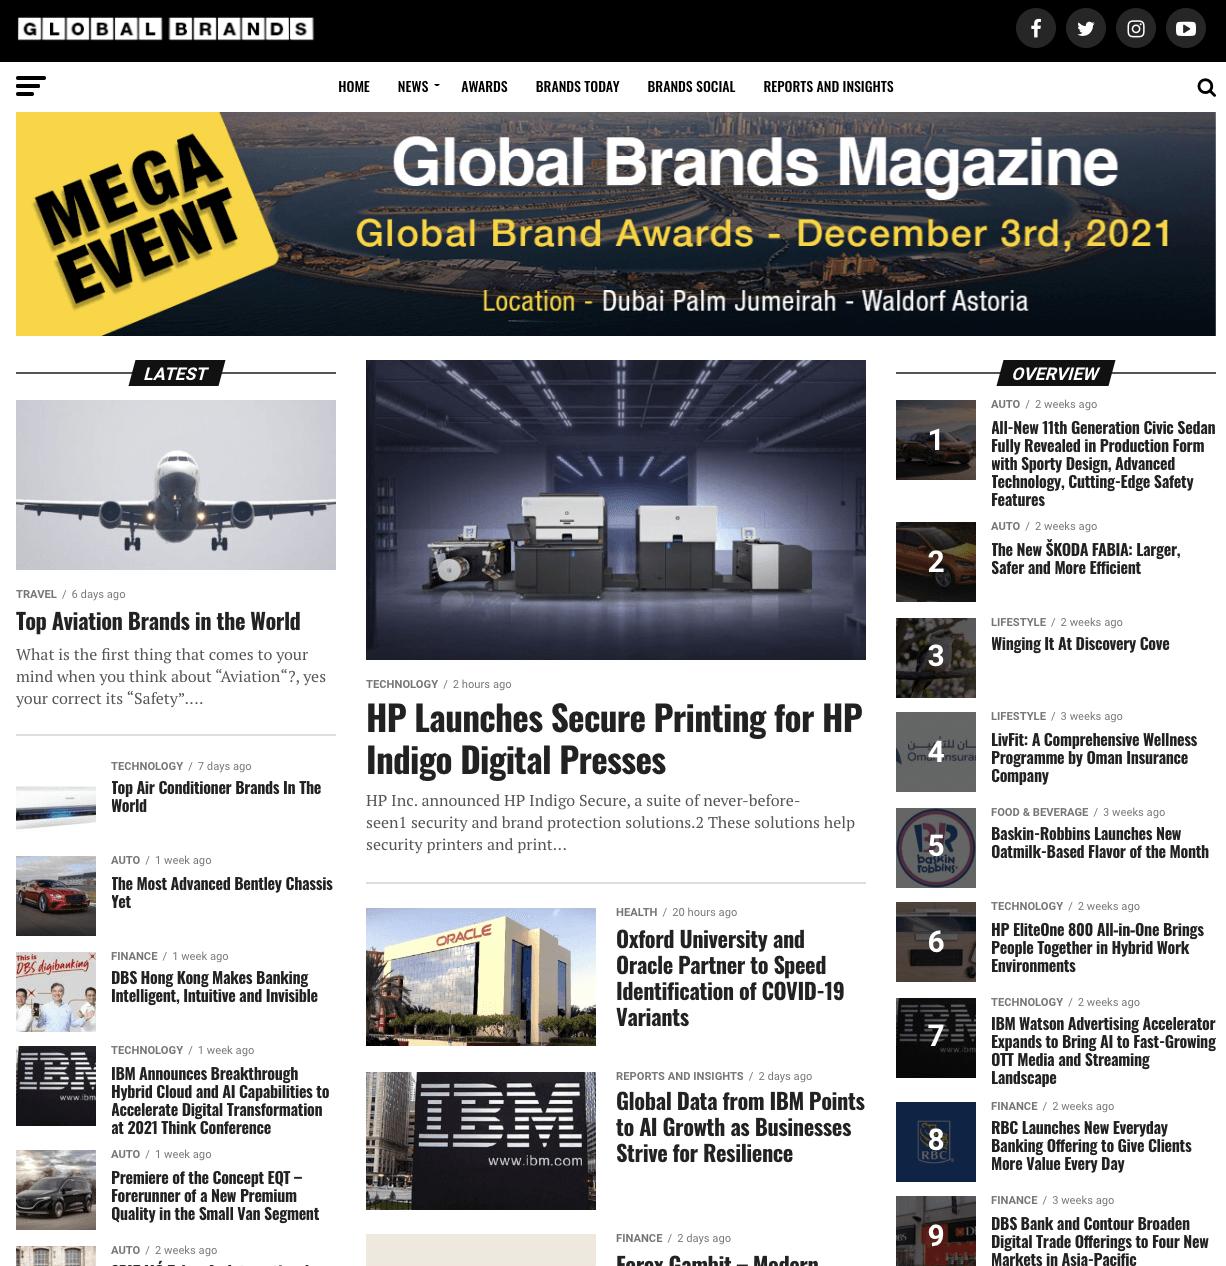 Global Brands, November 2020